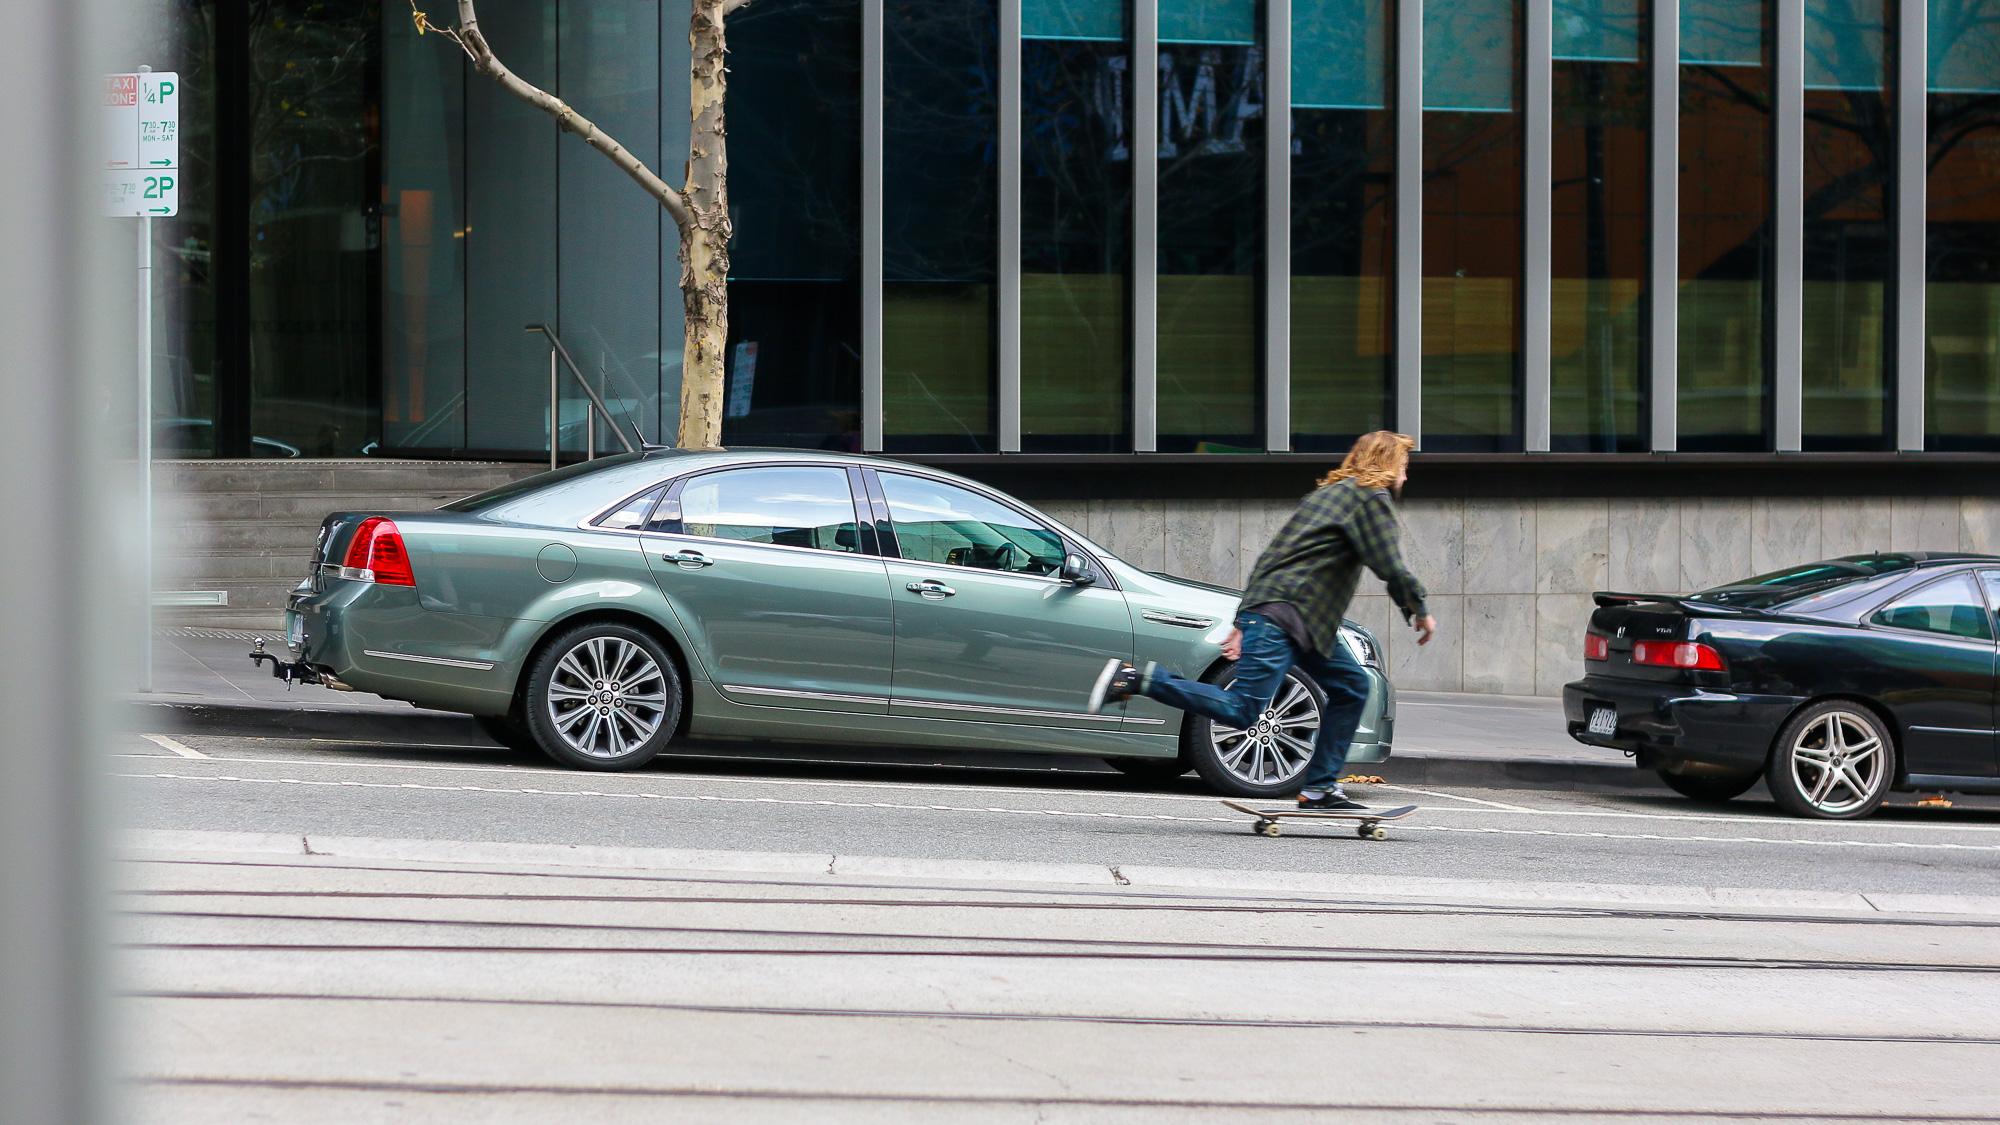 2014 Holden Caprice V Review Photos Caradvice